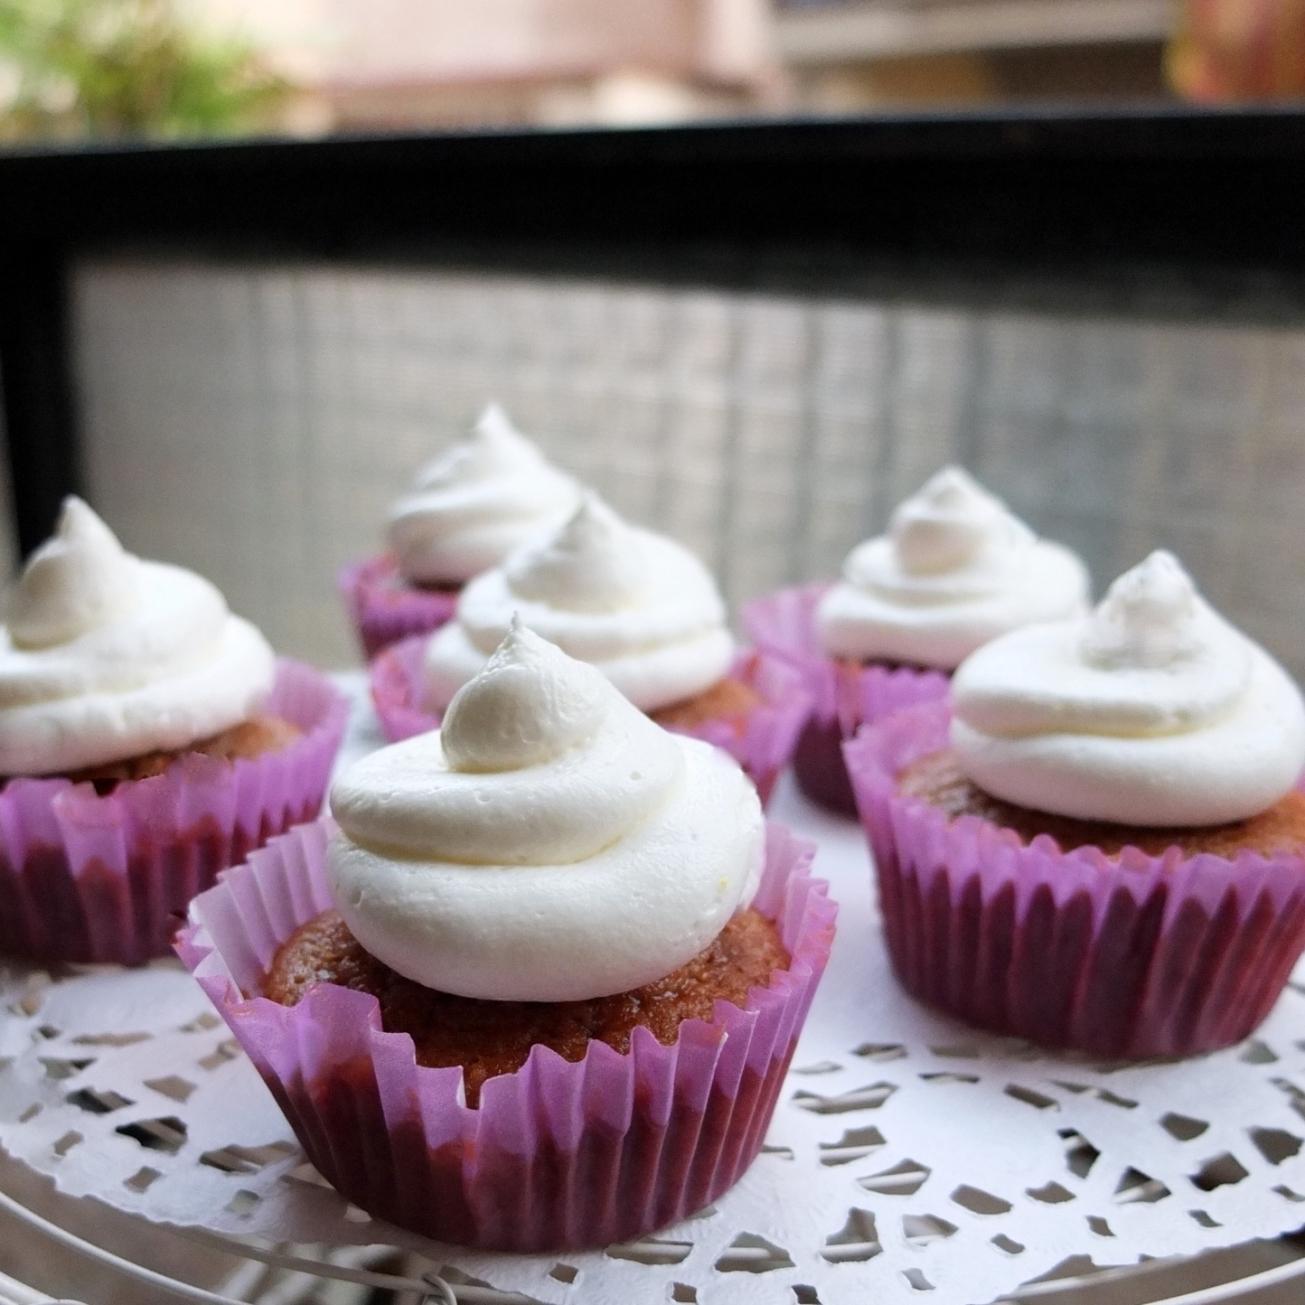 Jamaican ginger cupcakes